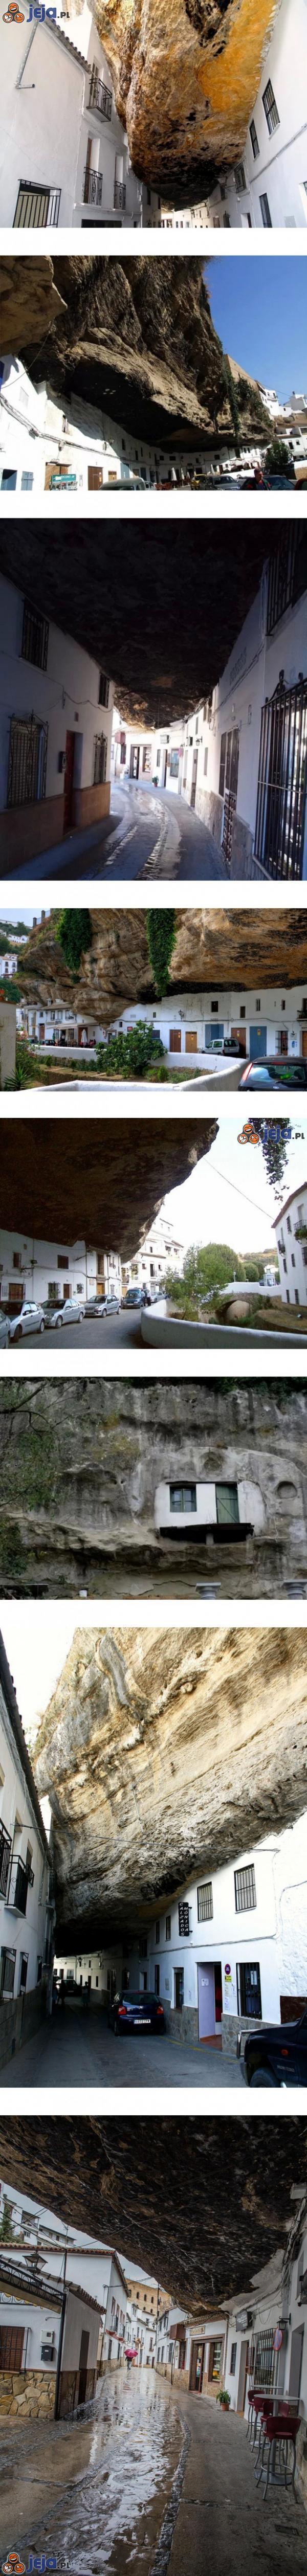 Miasto pod skałą